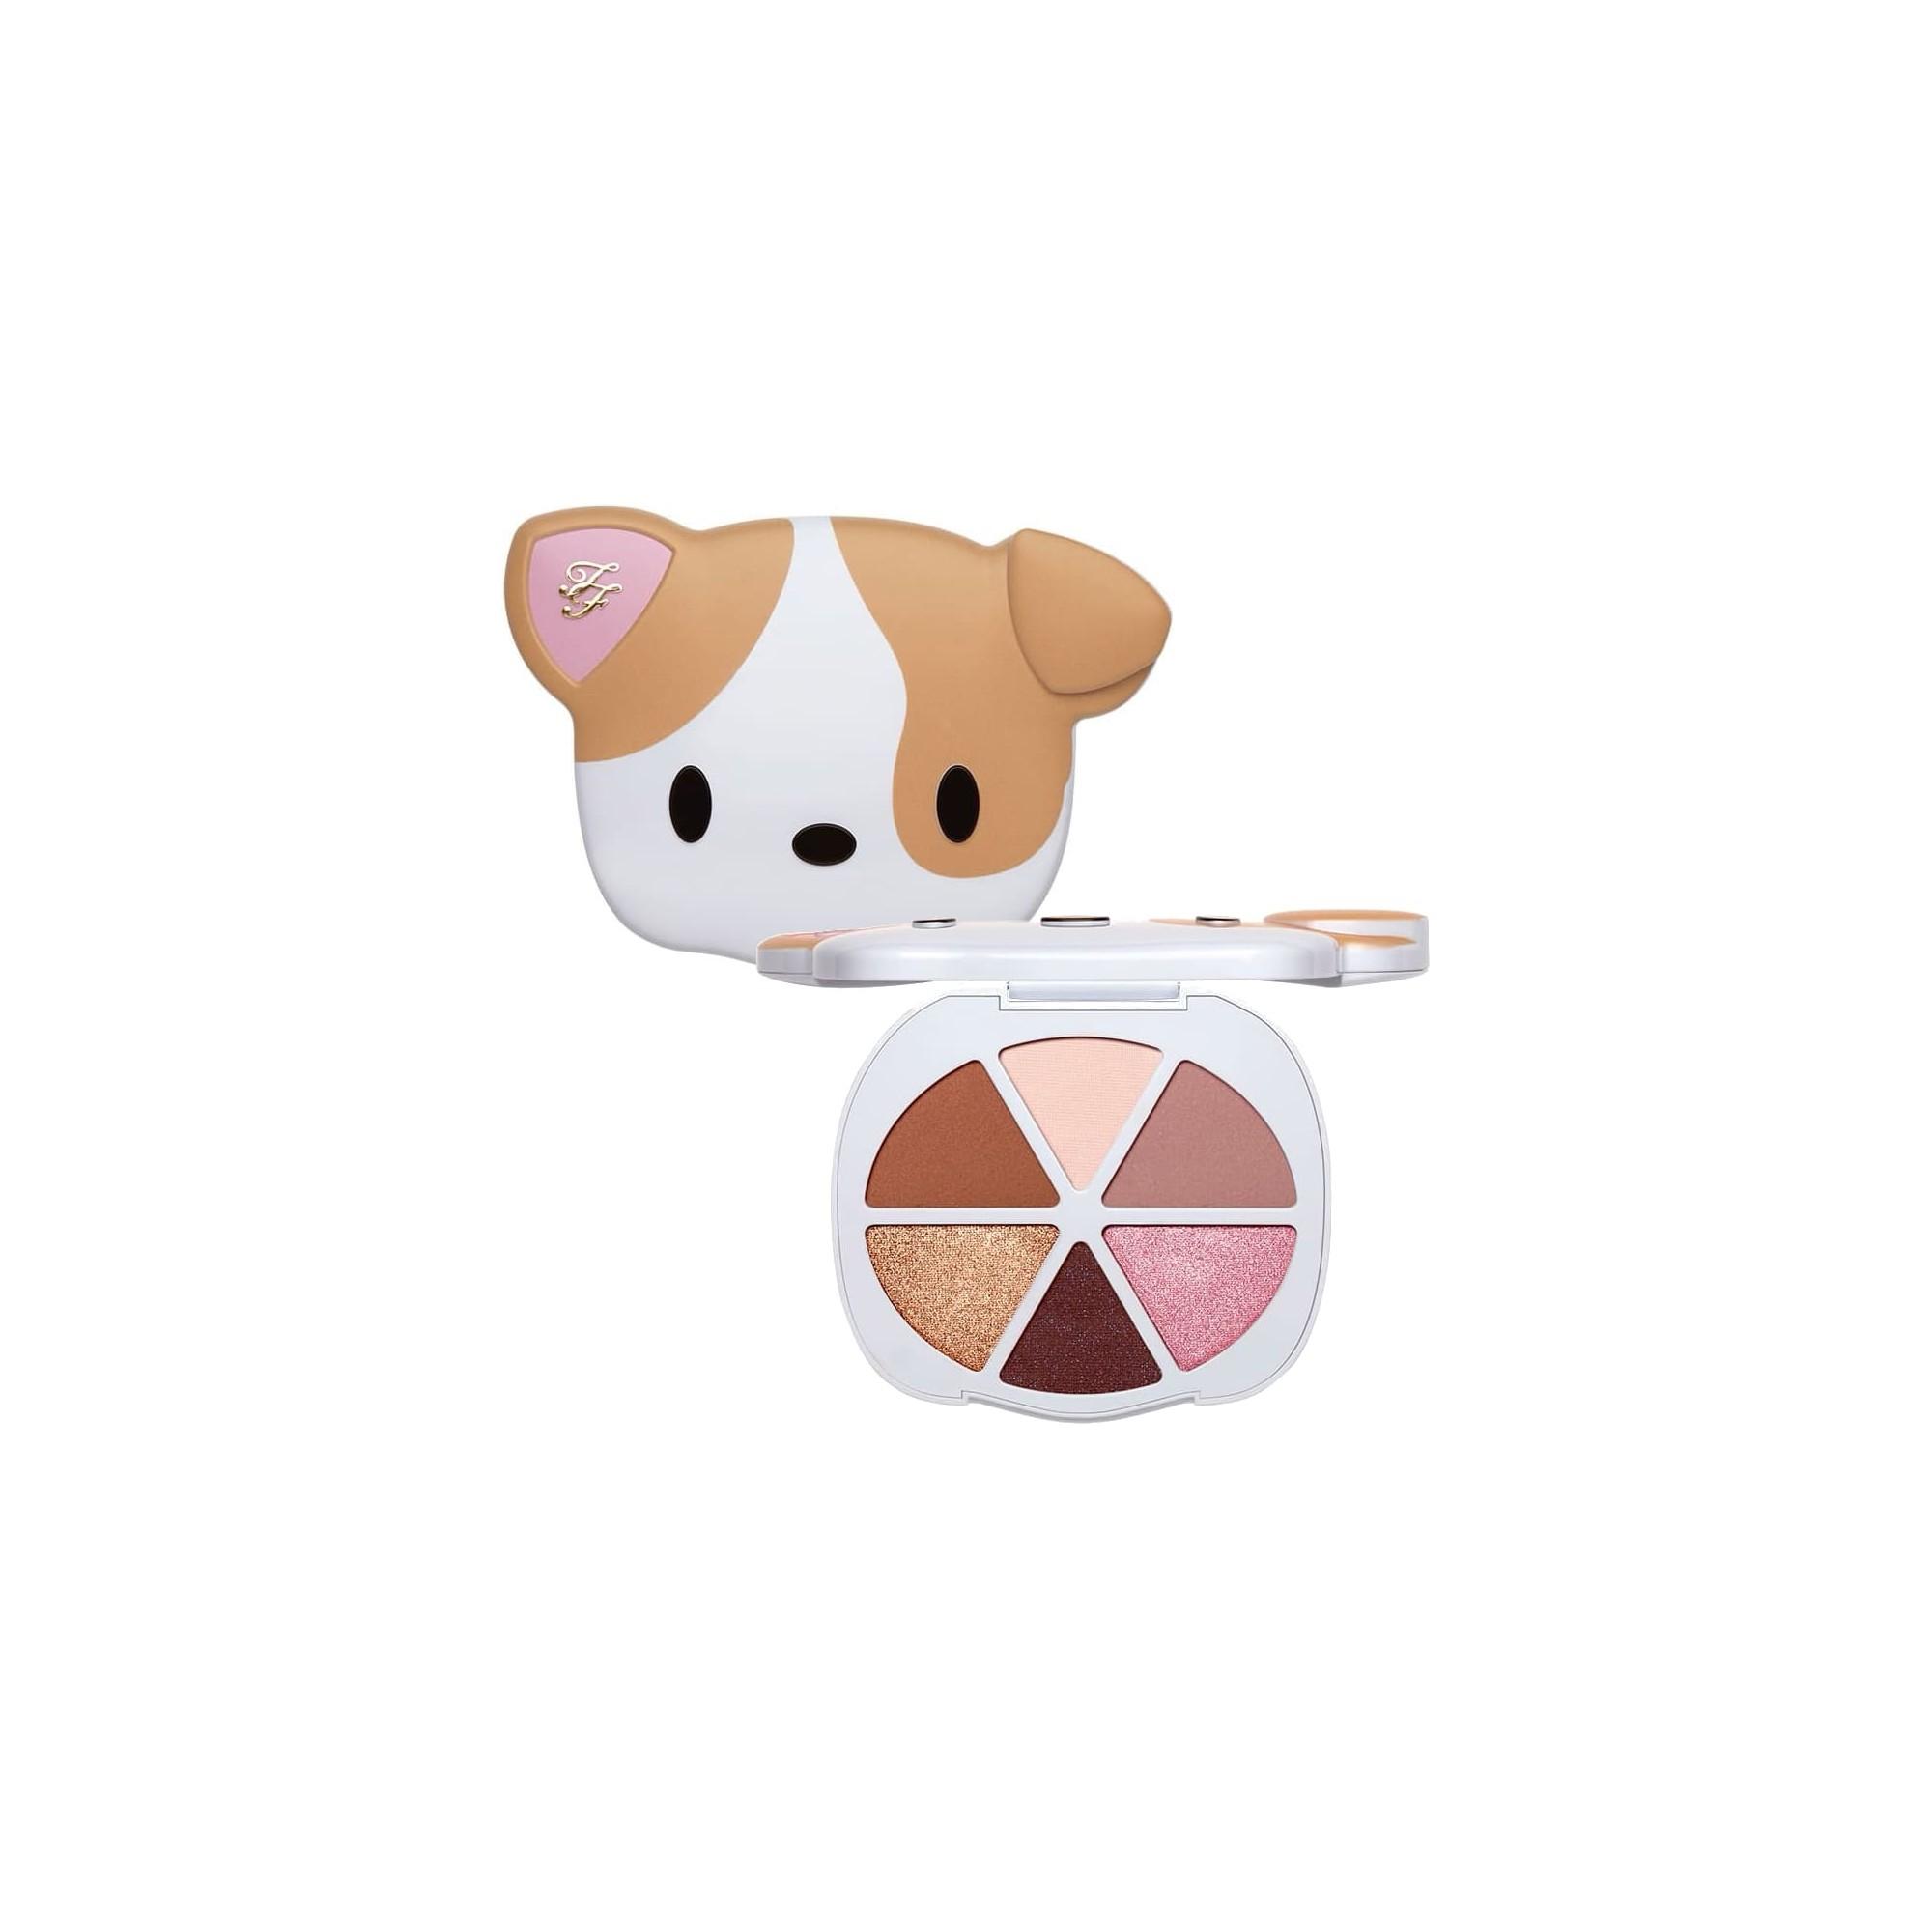 Too Faced Pretty Puppy Eye Shadow Palette